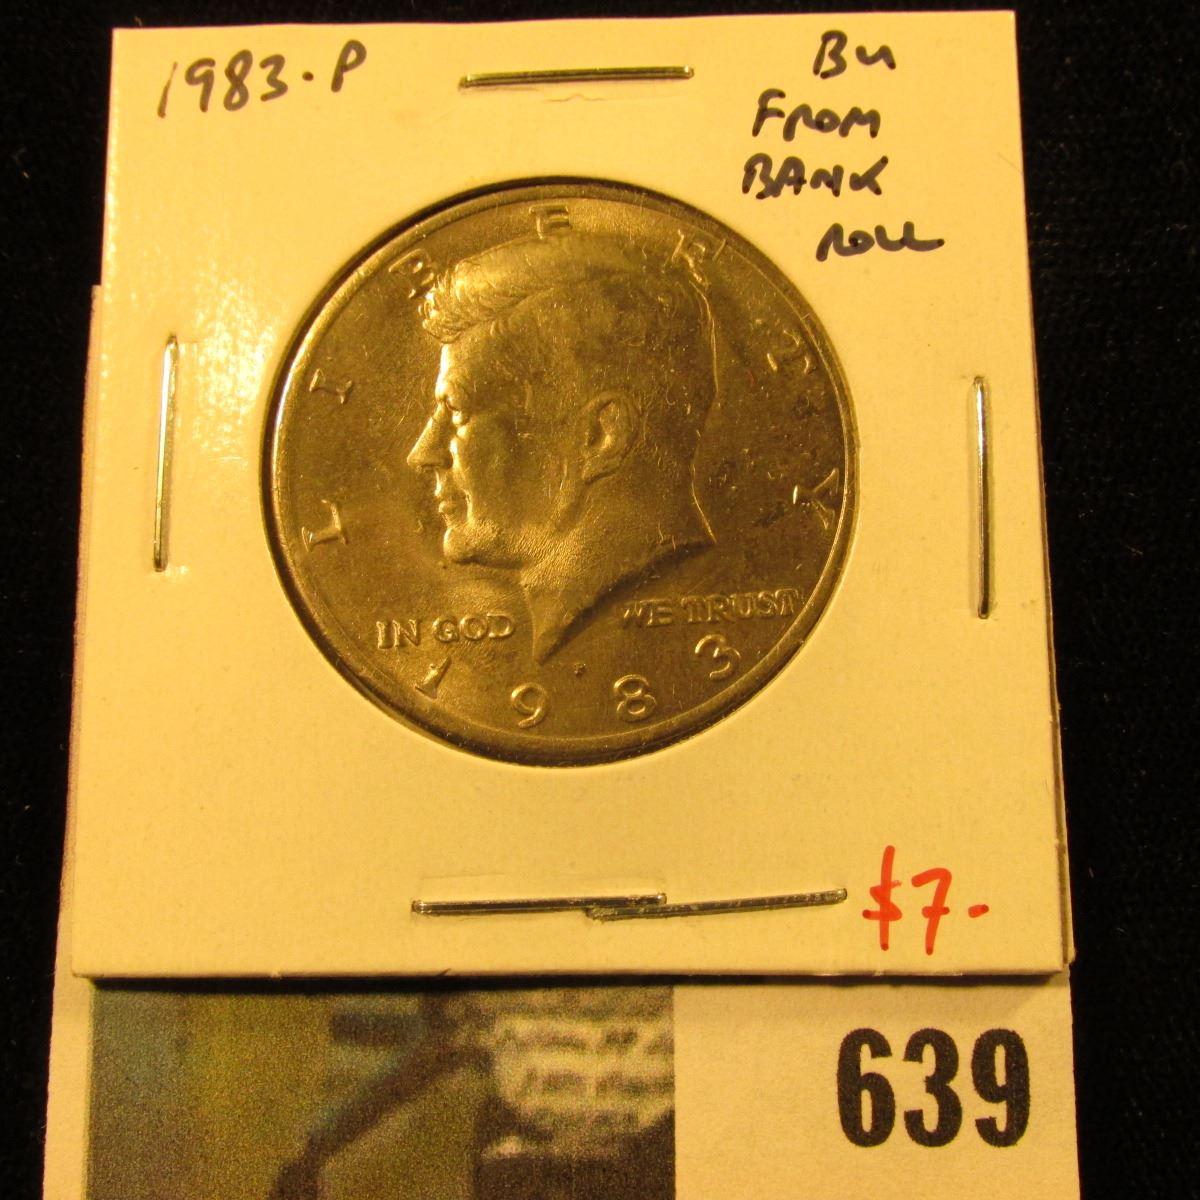 1983 P Kennedy Half Dollar from Bank Roll